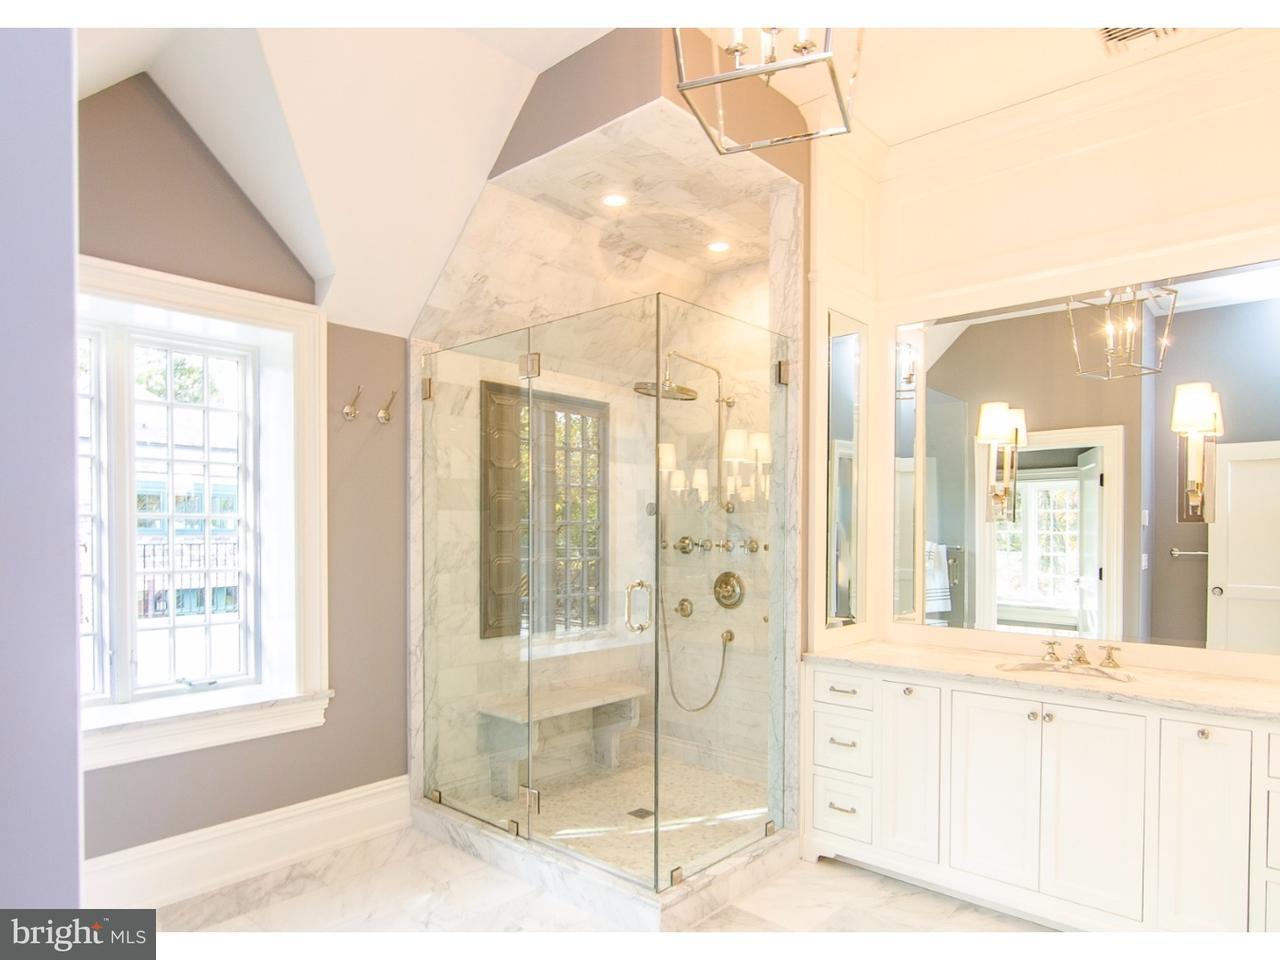 Additional photo for property listing at 75 CLEVELAND Lane  Princeton, Nueva Jersey 08540 Estados Unidos